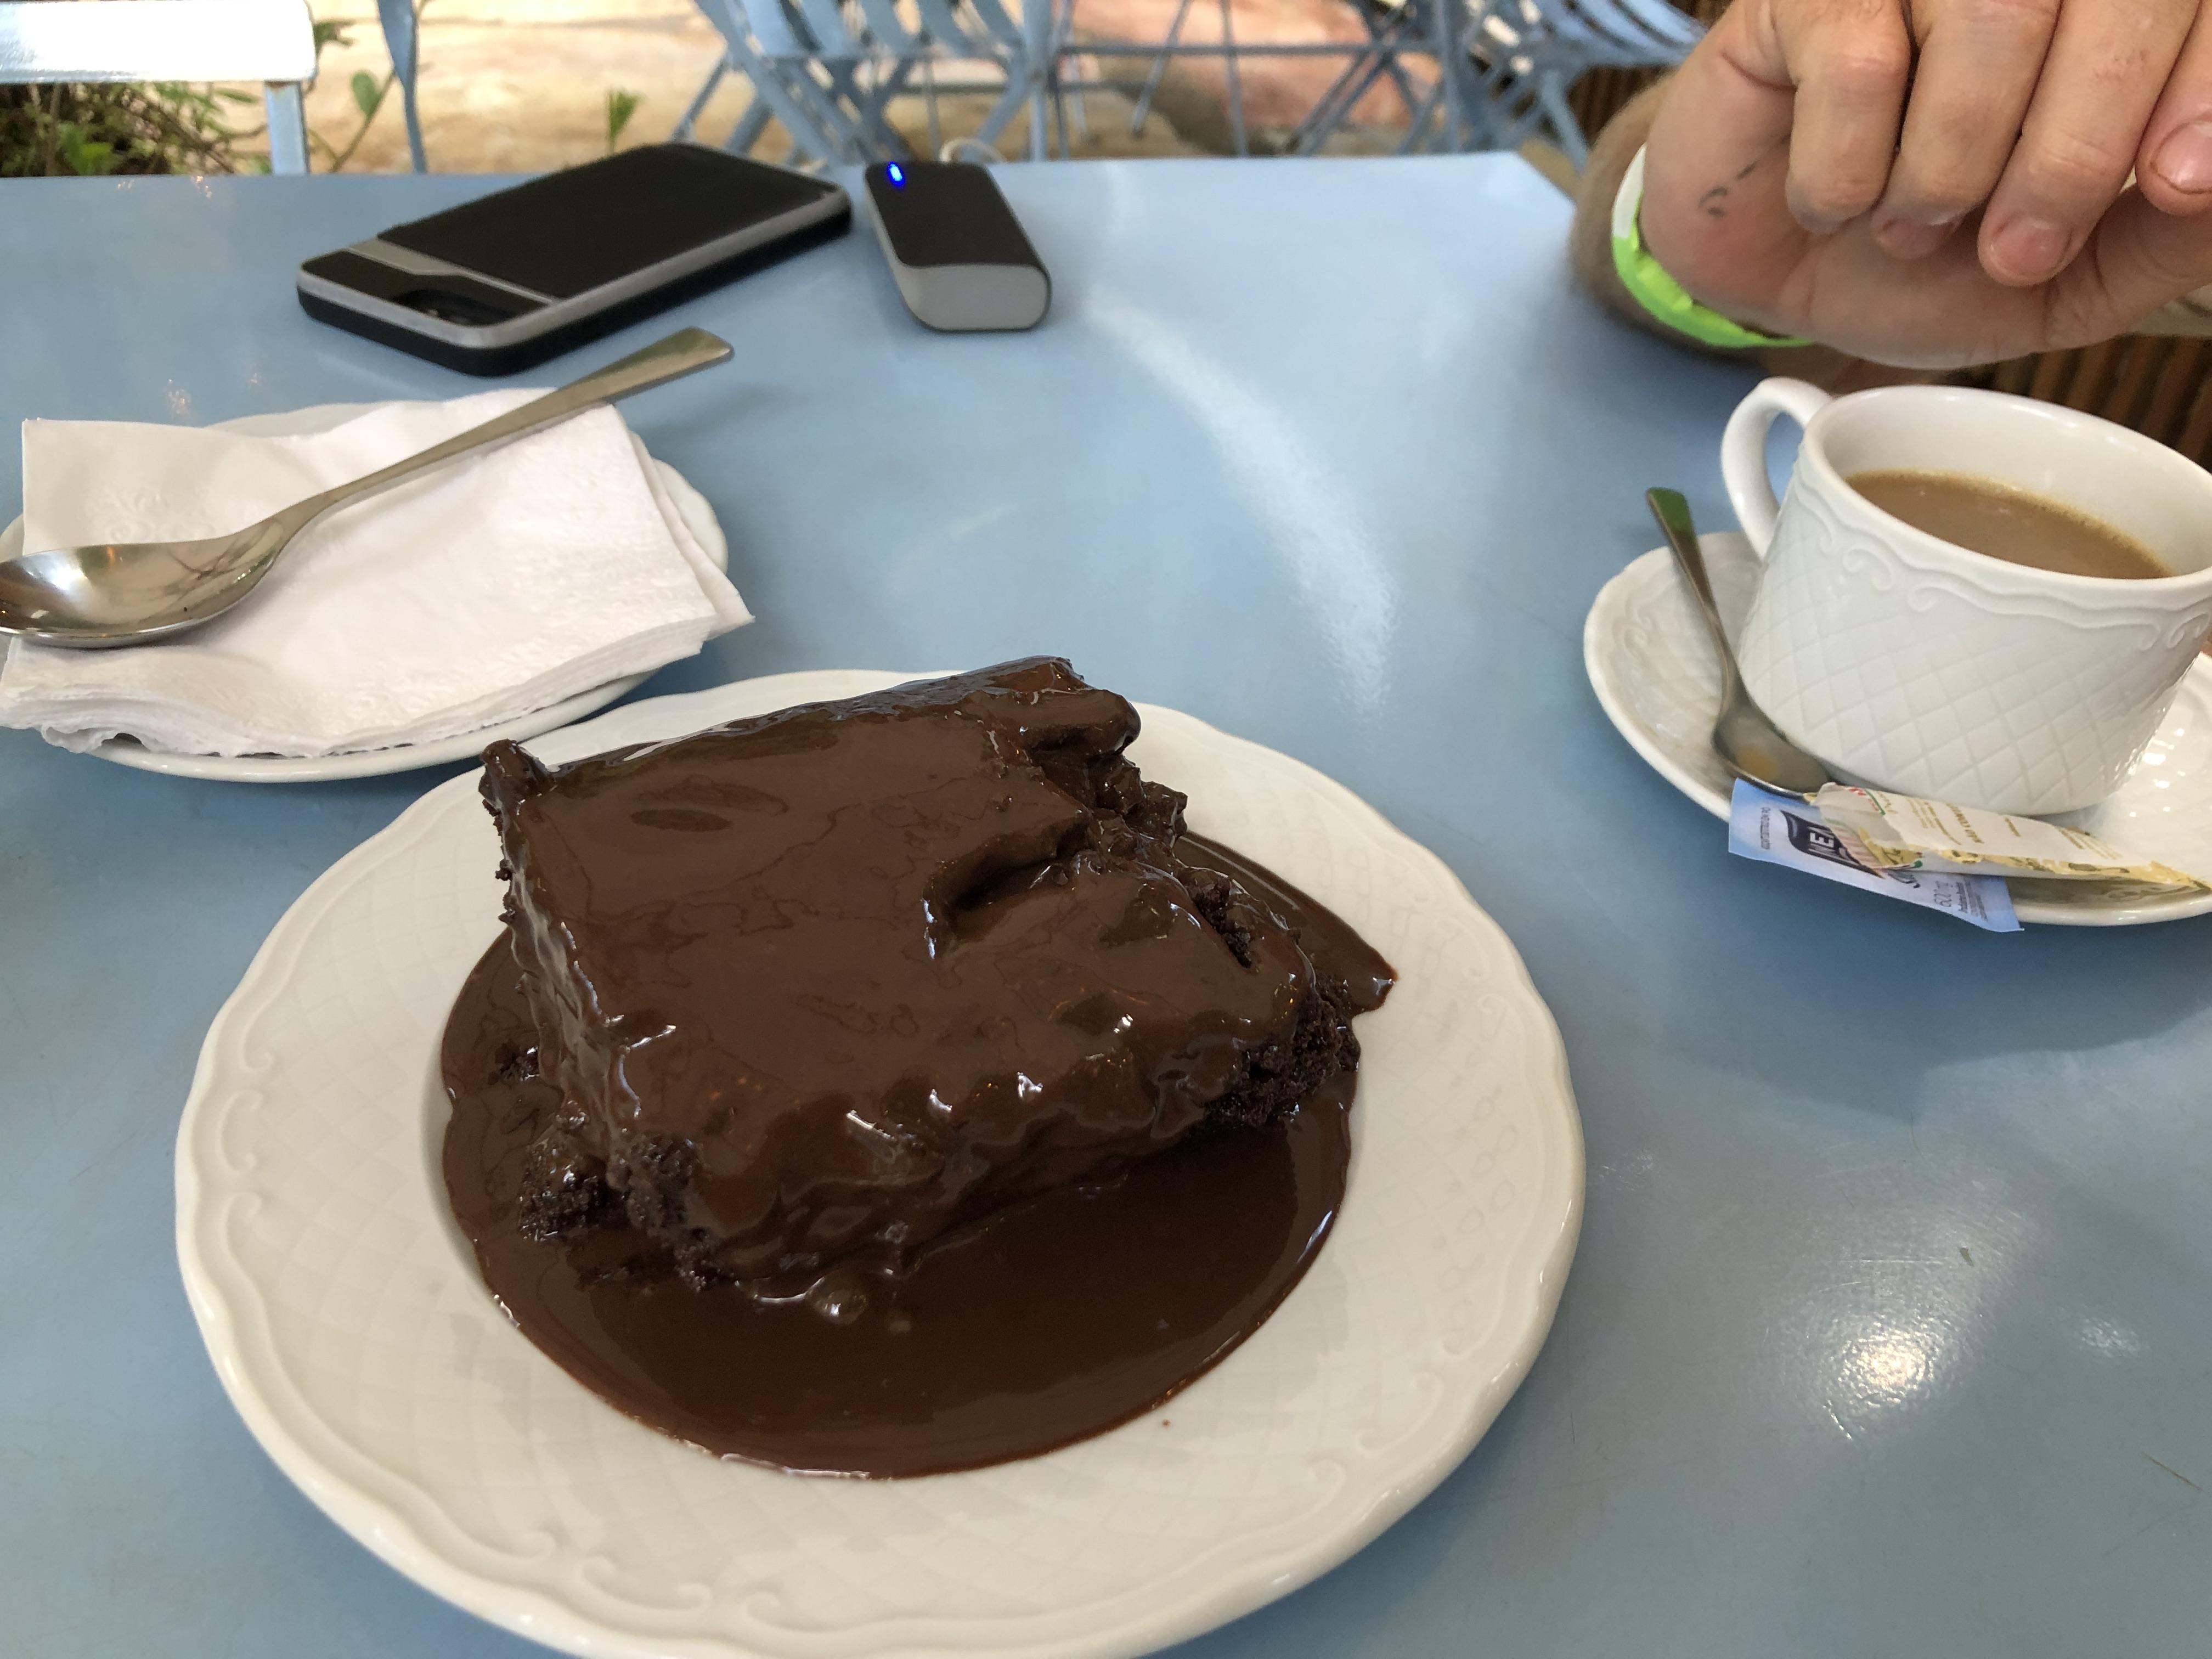 inhotim chocolate cake.JPG